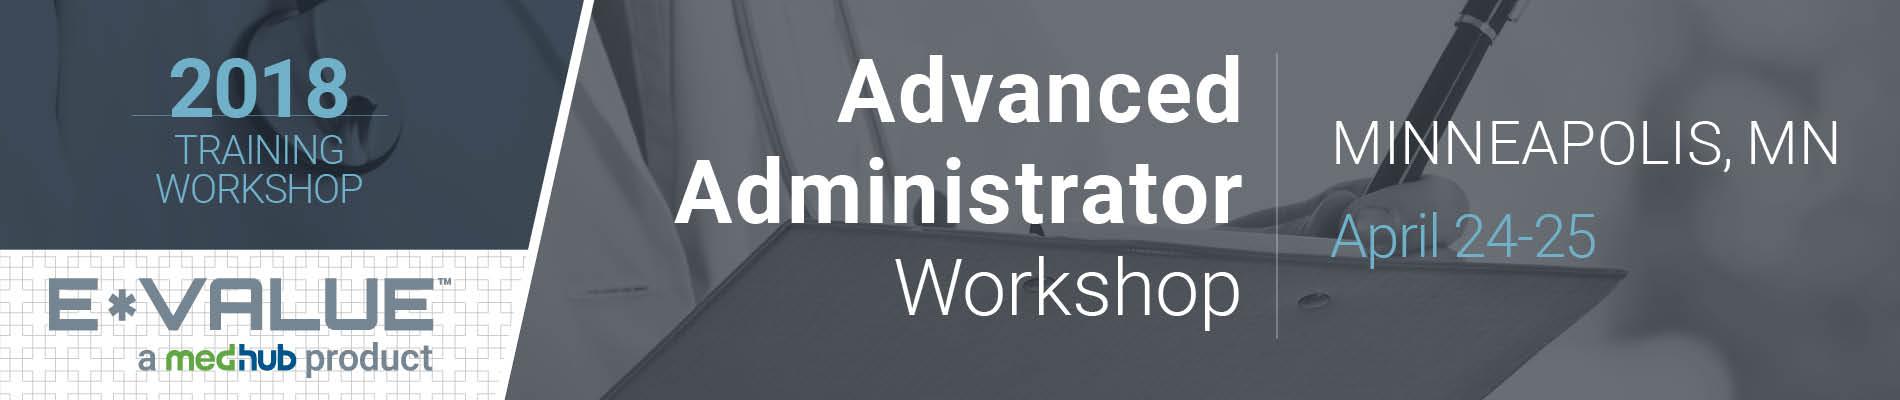 Advanced E*Value Administrator Workshop (April 24-25)